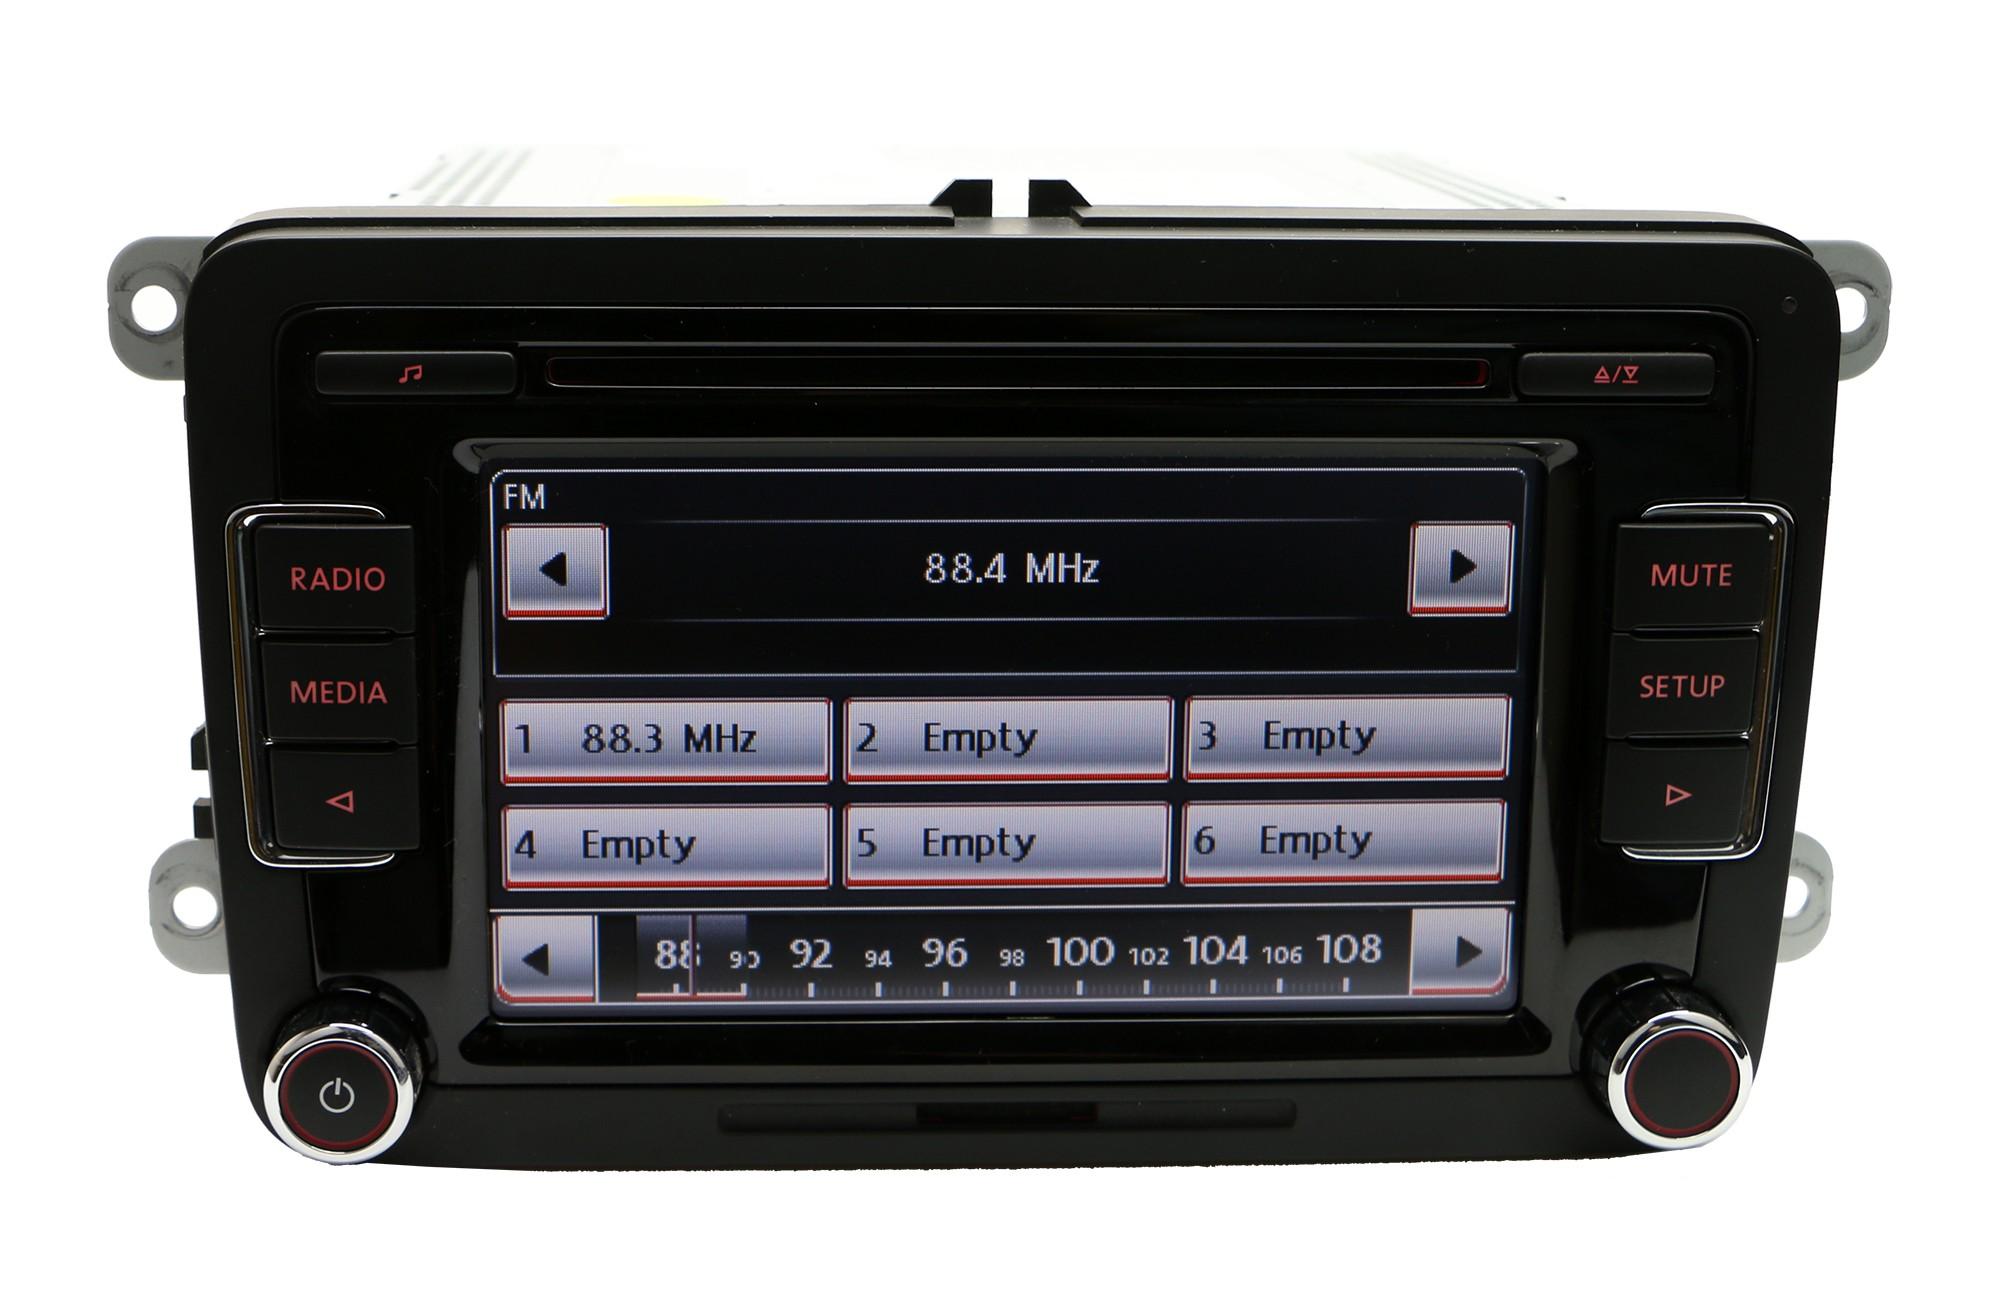 volkswagen rcd510rvc 6 disc cd player rcd510 radio golf. Black Bedroom Furniture Sets. Home Design Ideas